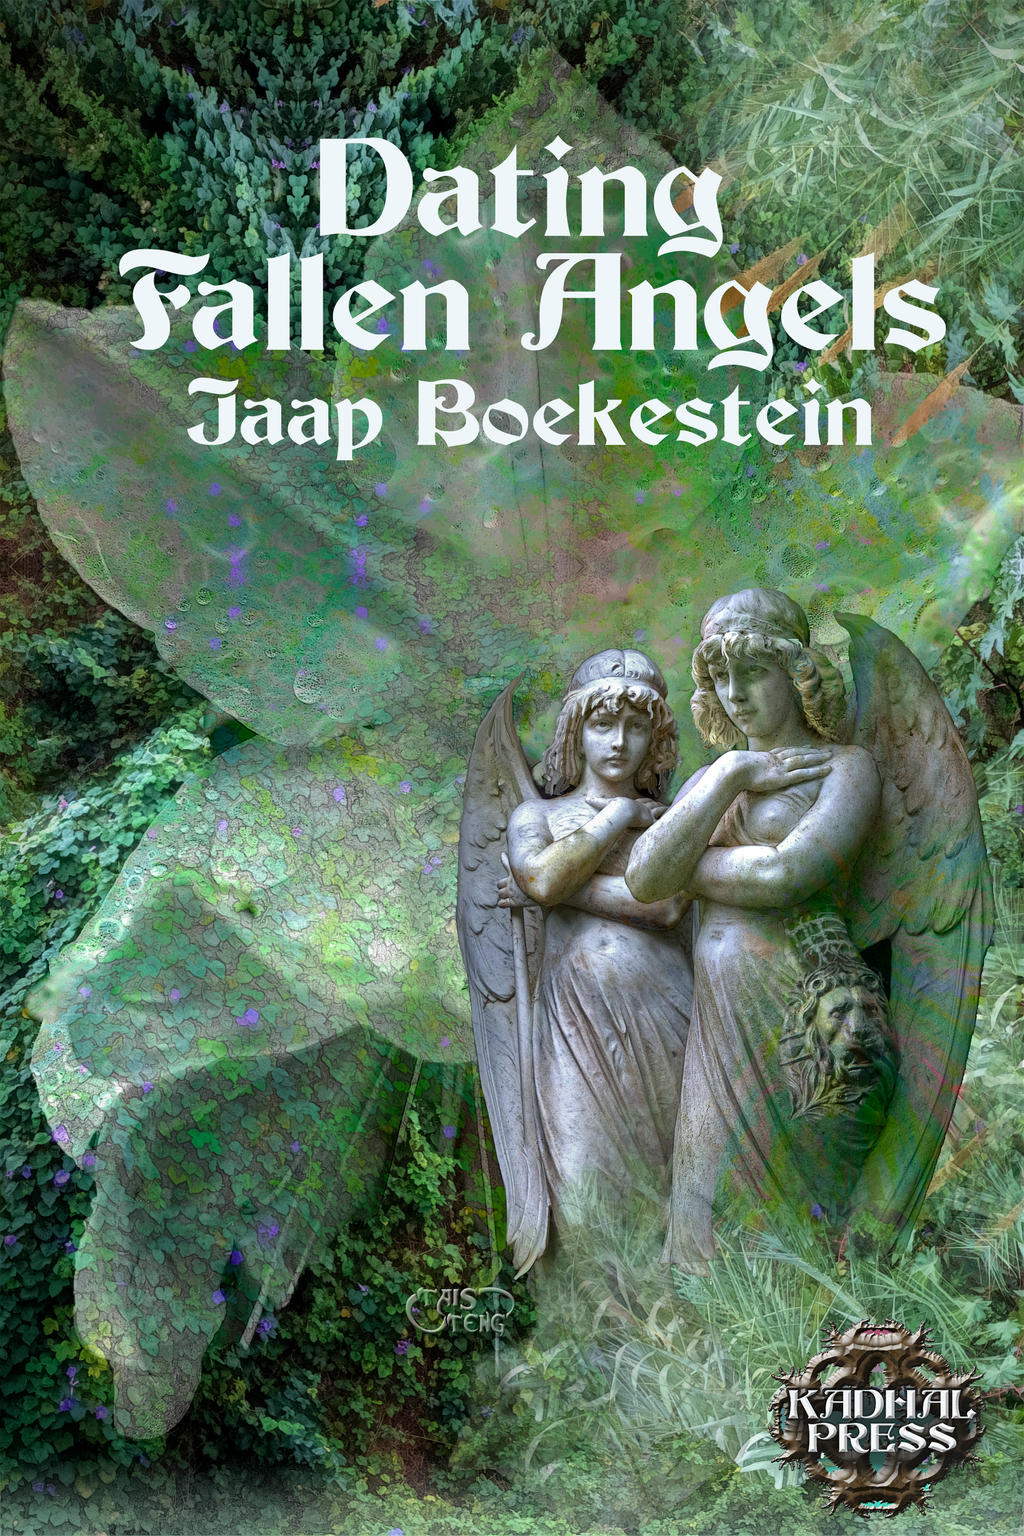 cover for DATING FALLEN ANGELS Jaap Boekestein by taisteng